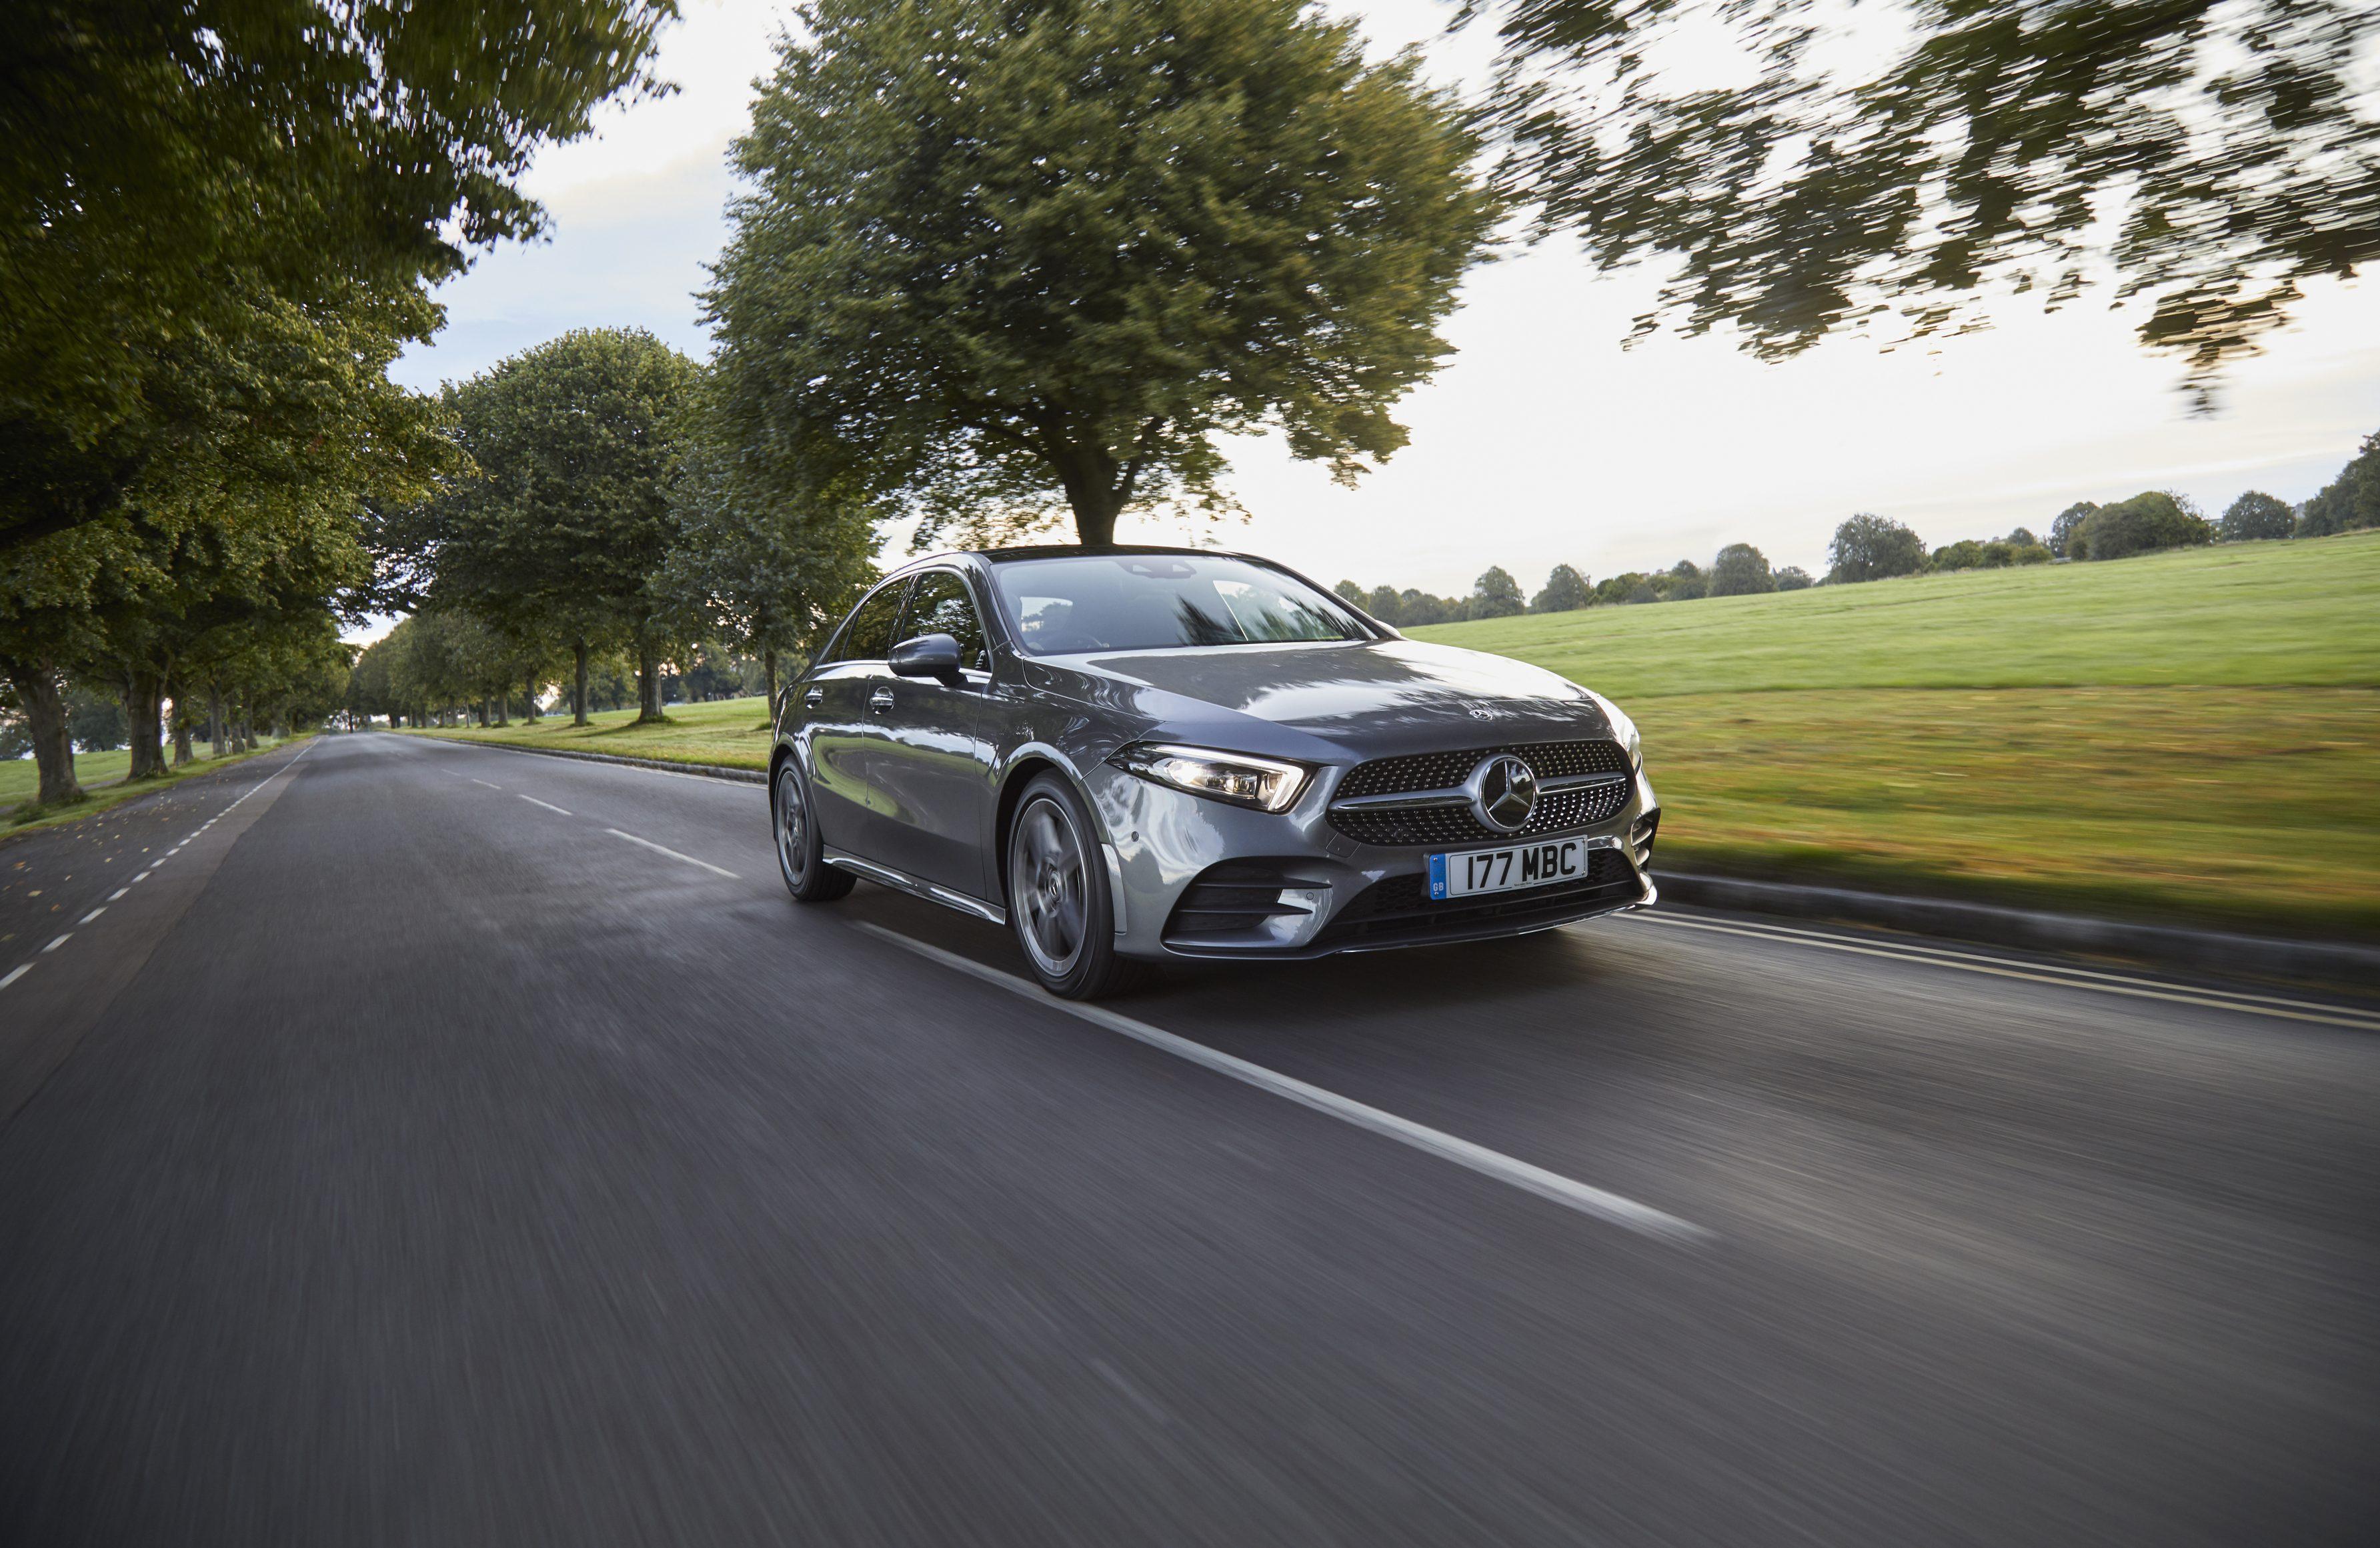 2021 Mercedes-Benz A-Class Saloon exterior